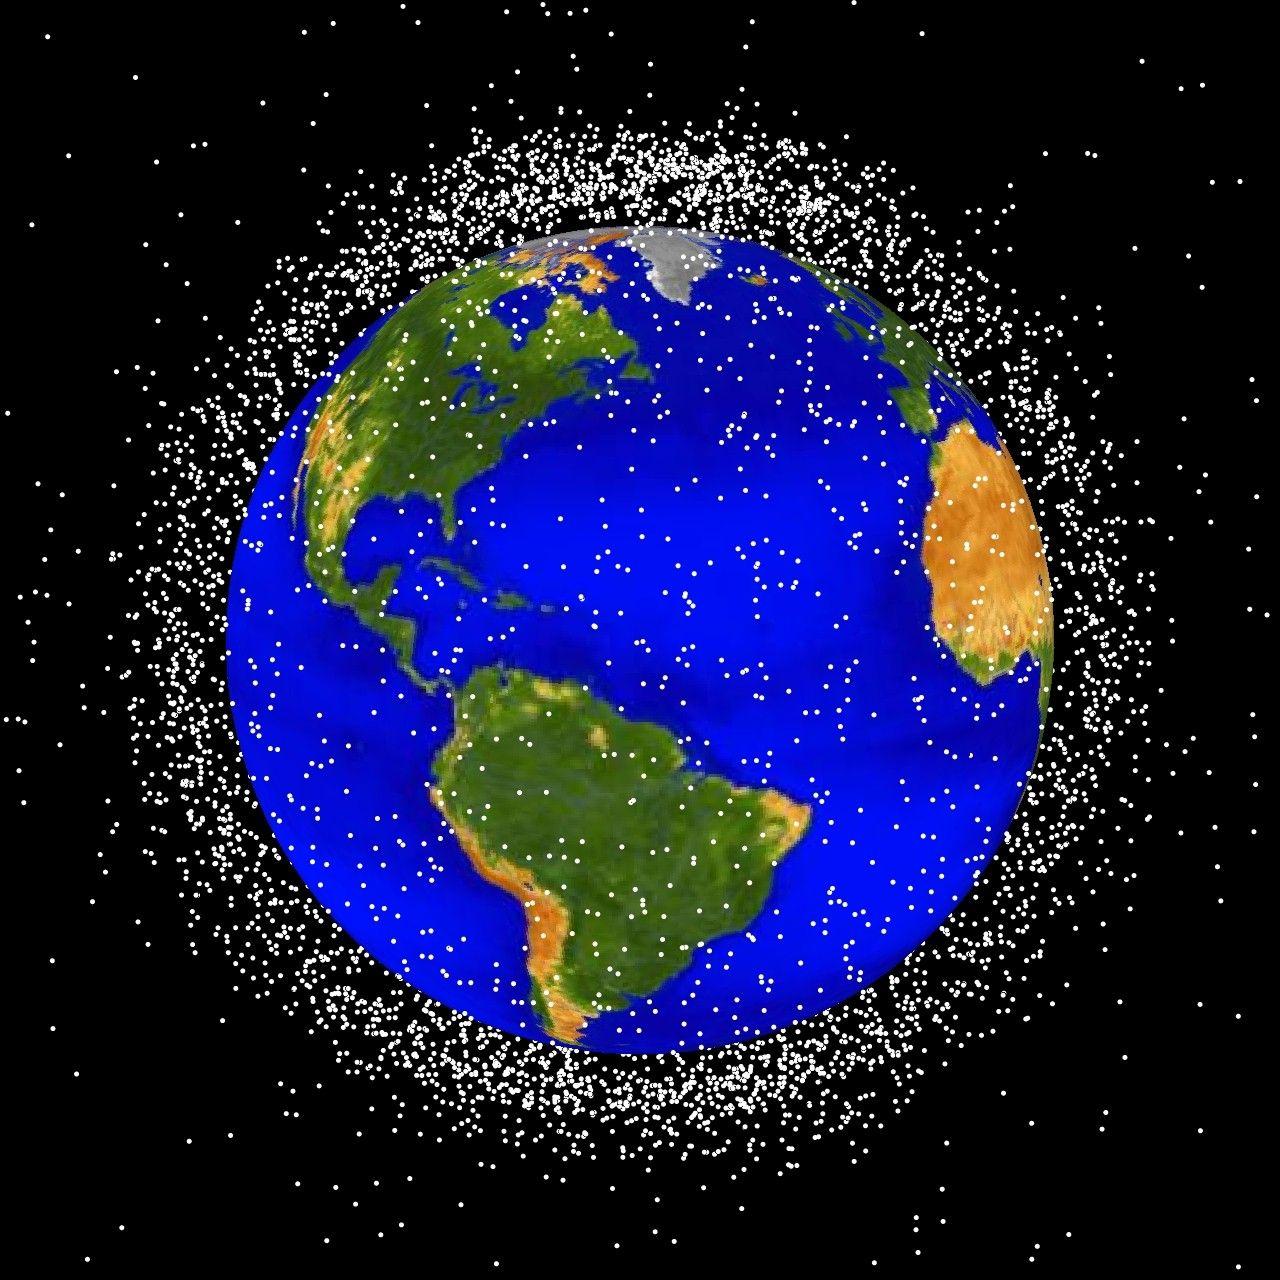 space debris1